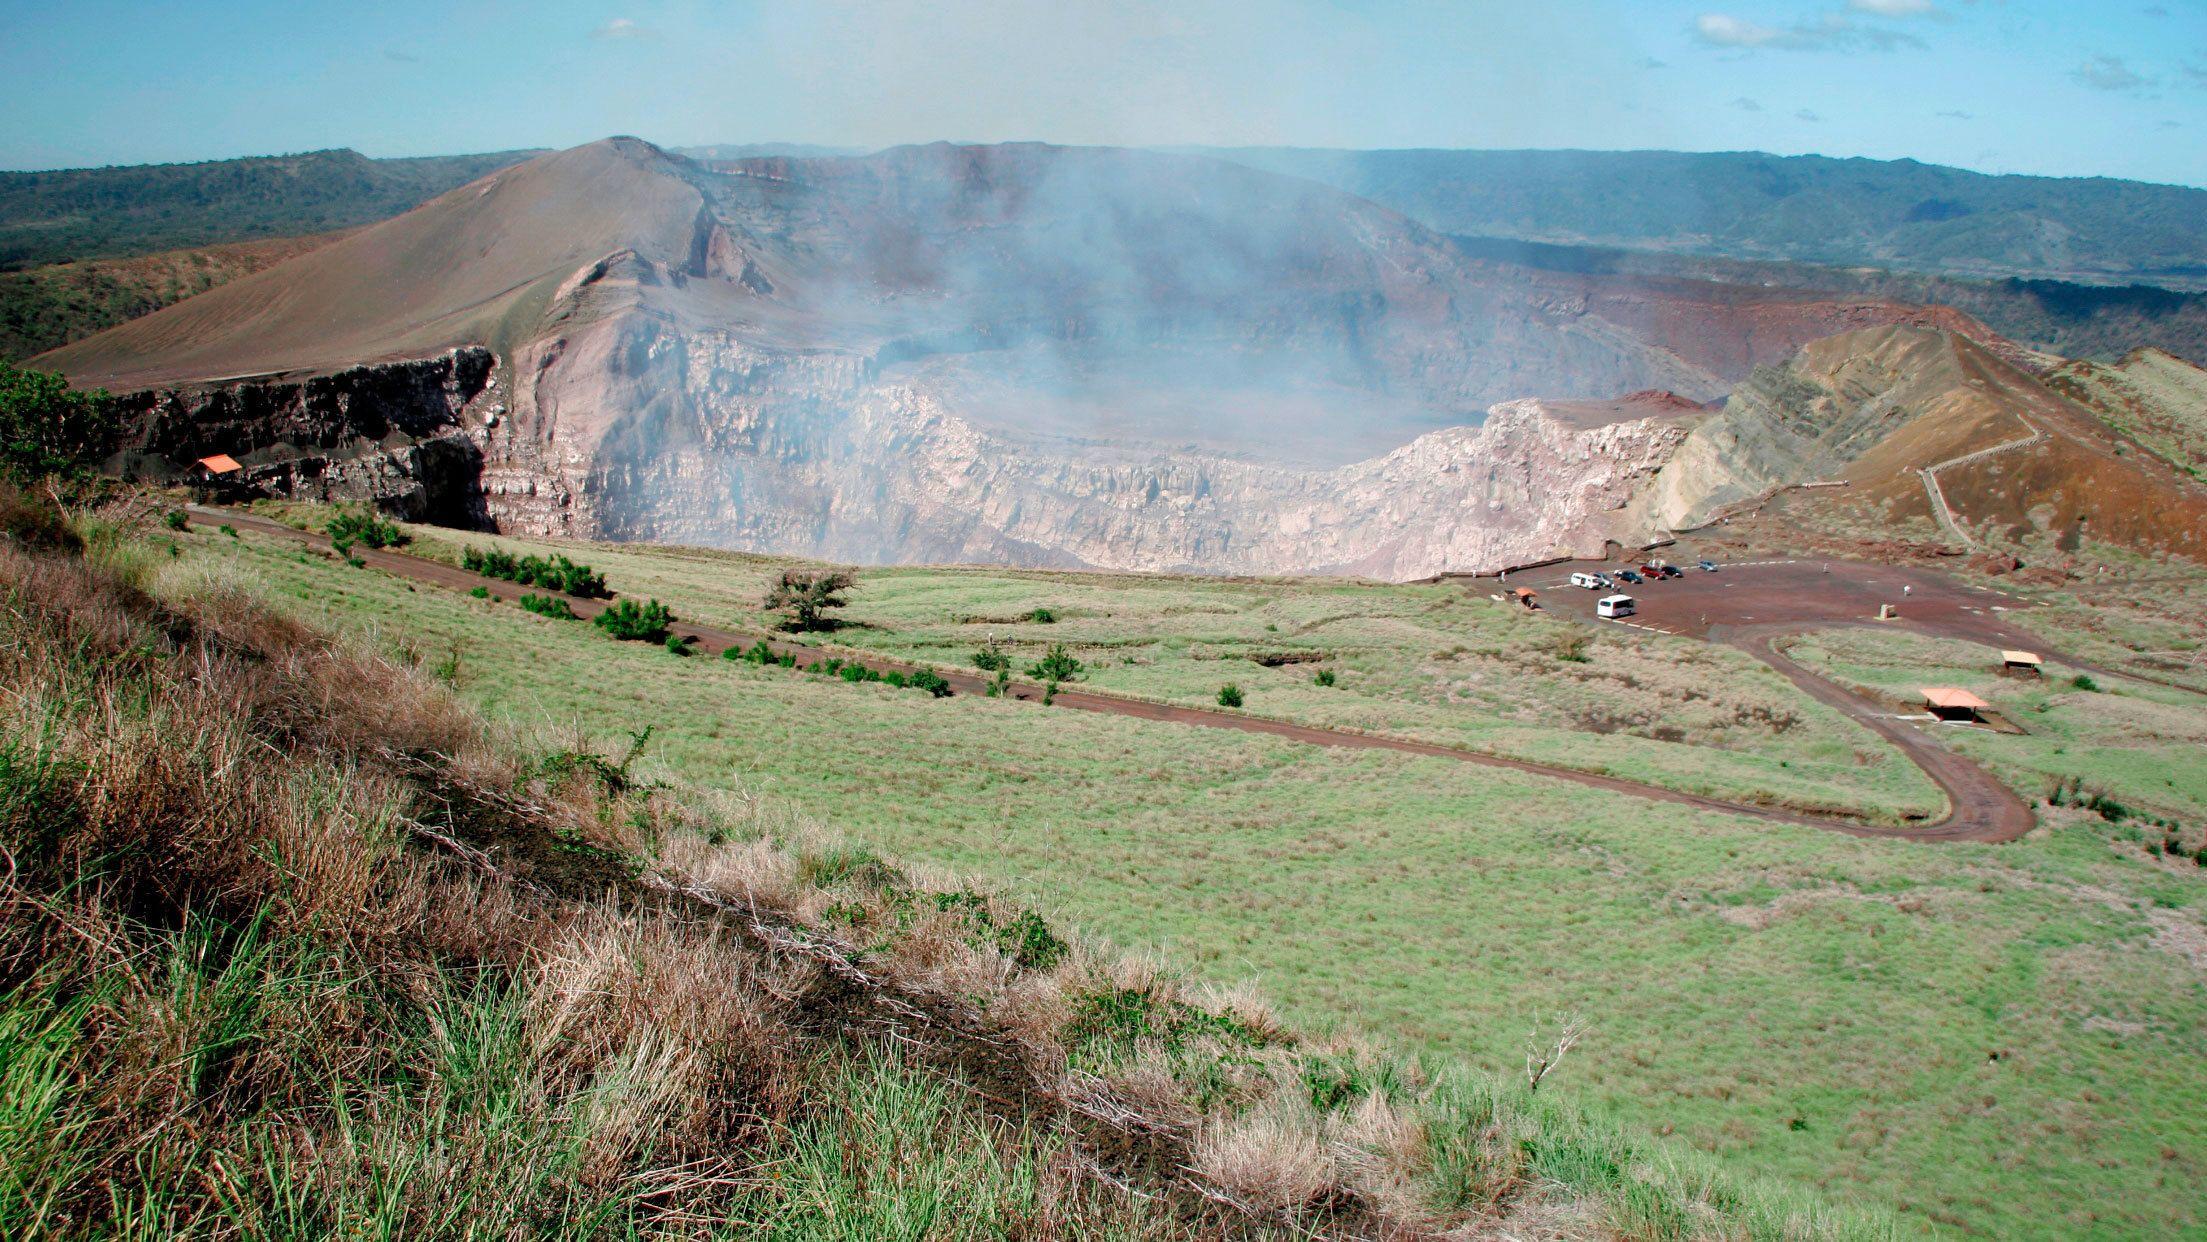 Opening of Santiago Crater in Nicaragua